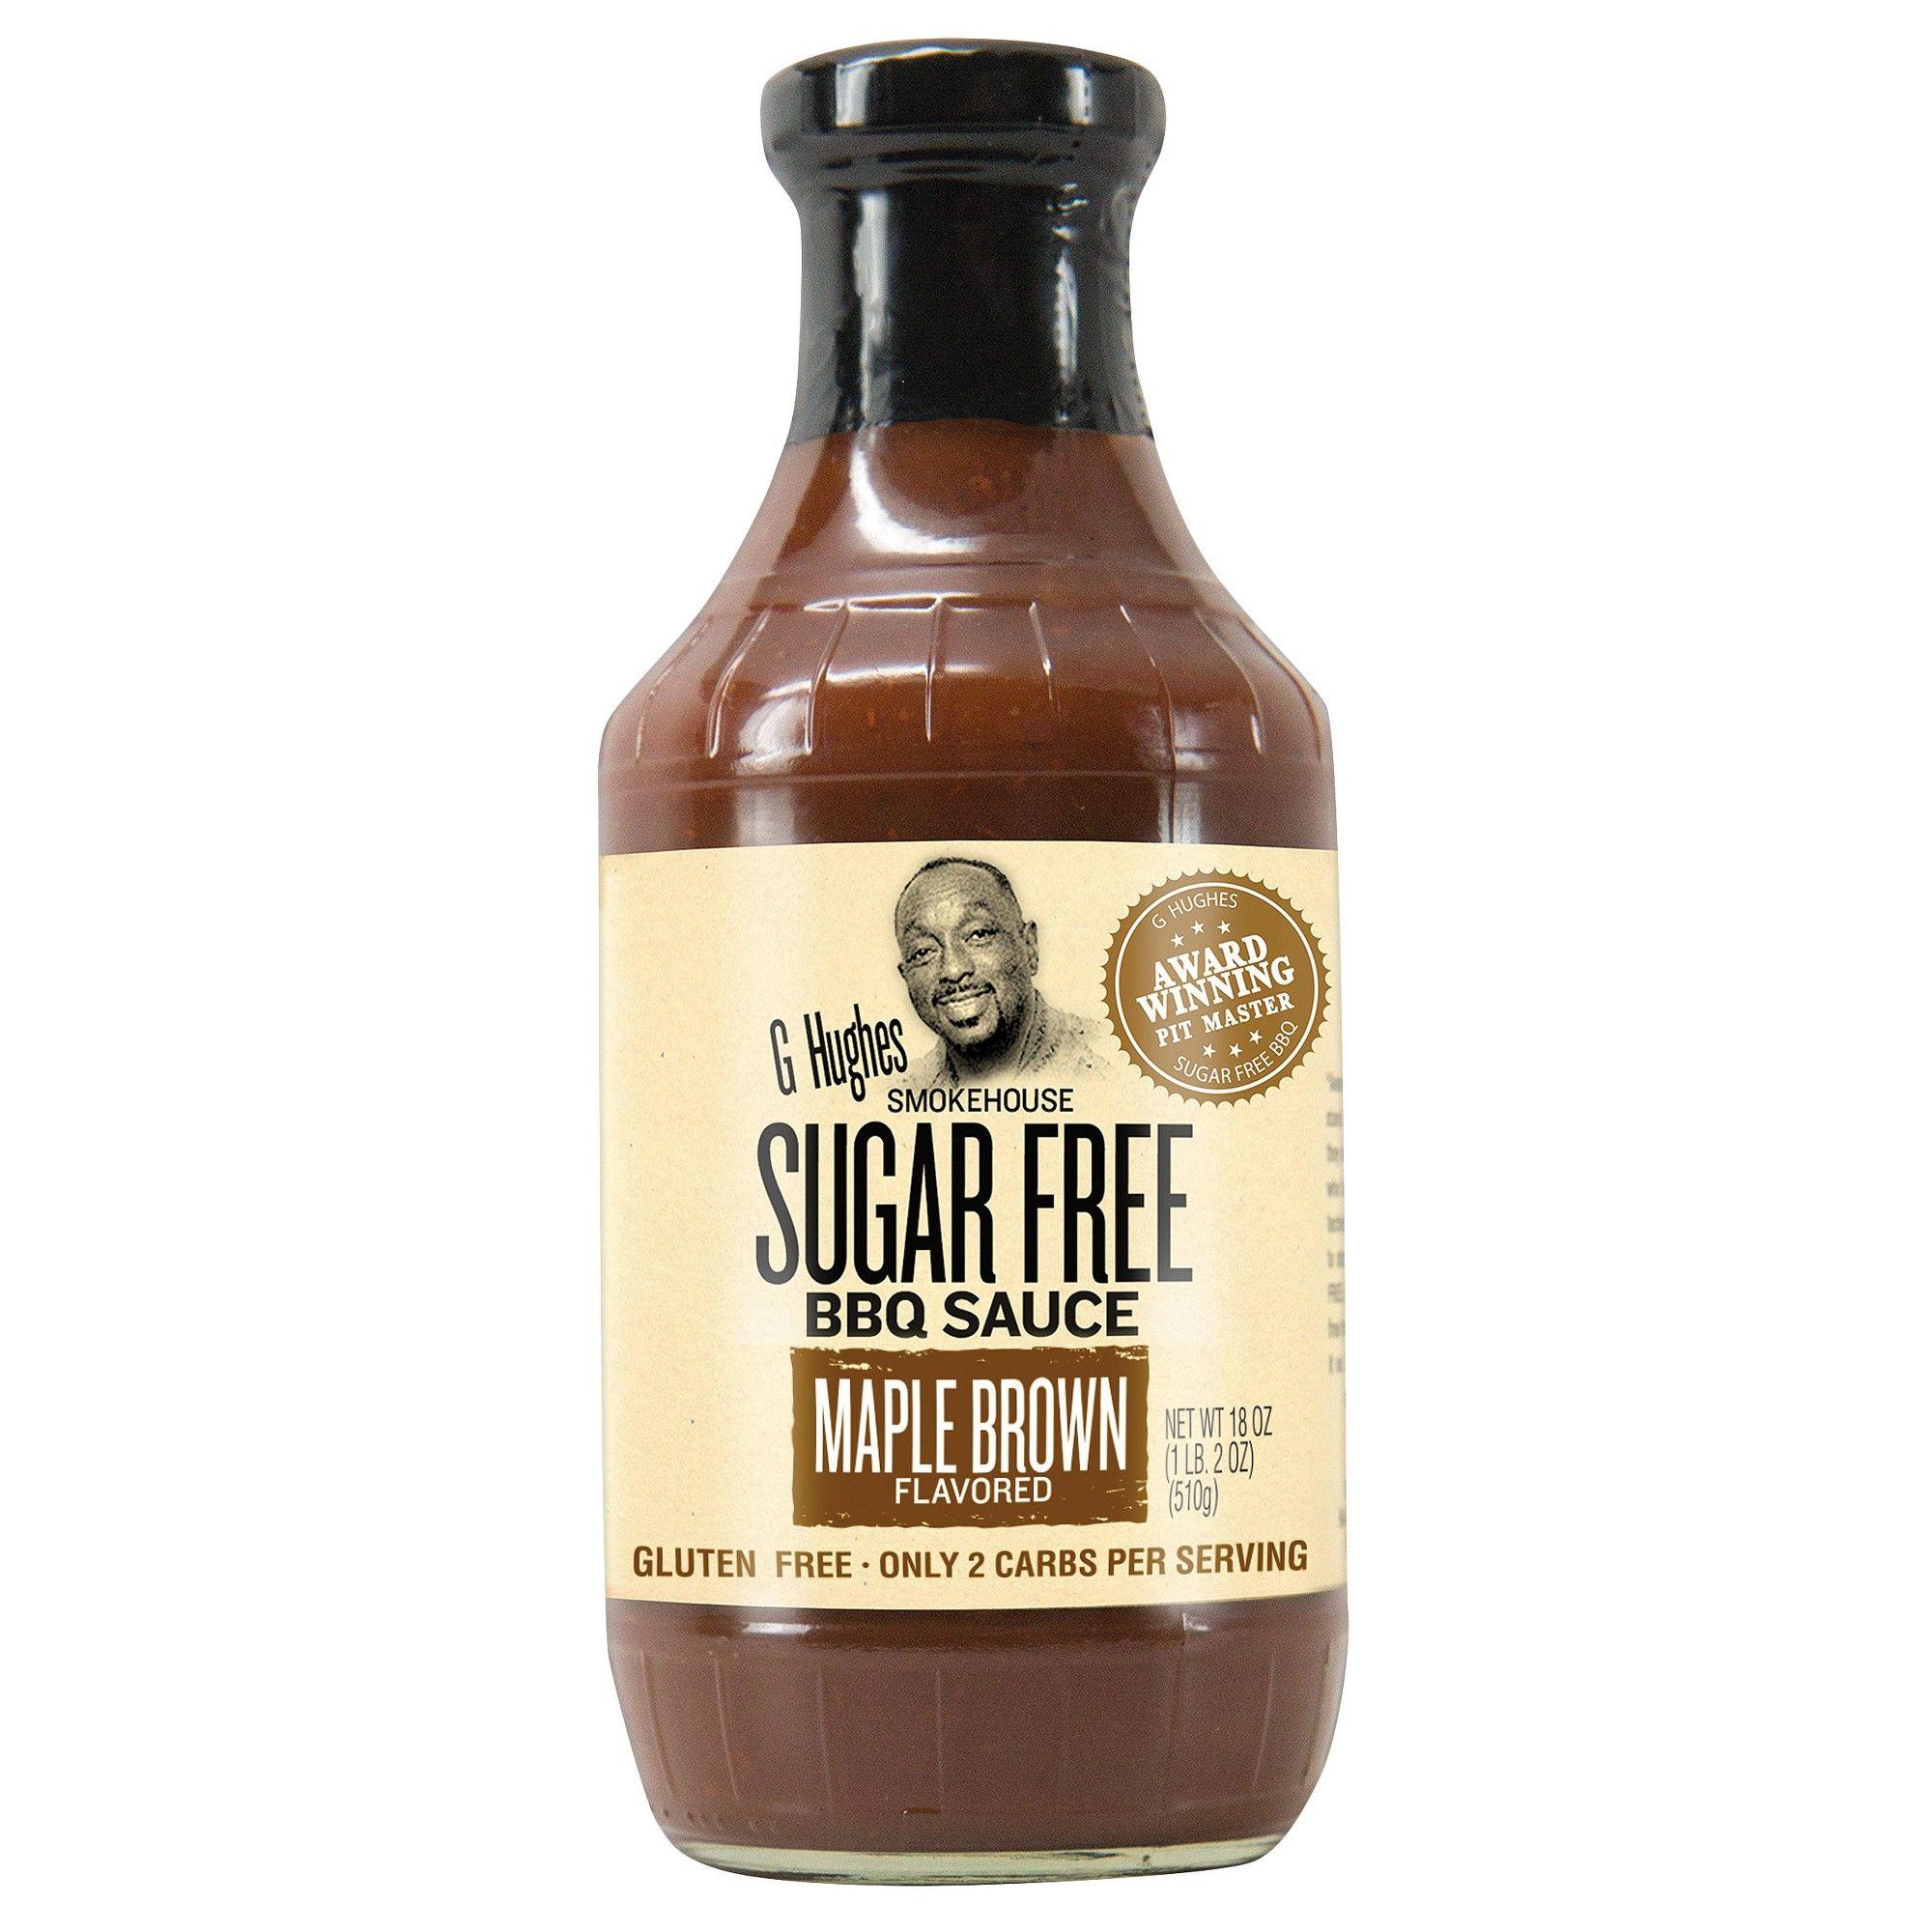 G hughes smokehouse sugar free bbq sauce maple brown